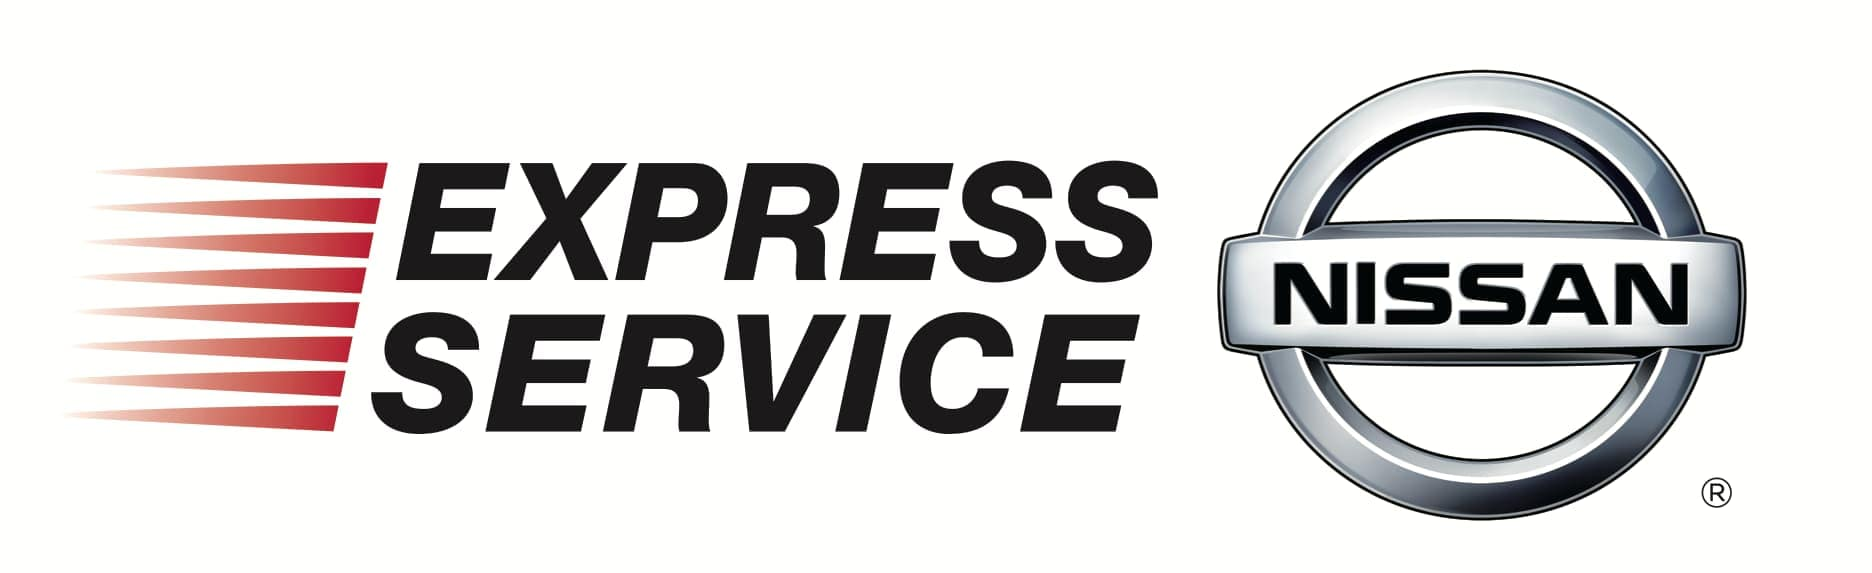 Nissan Express Service in Glendale, WI